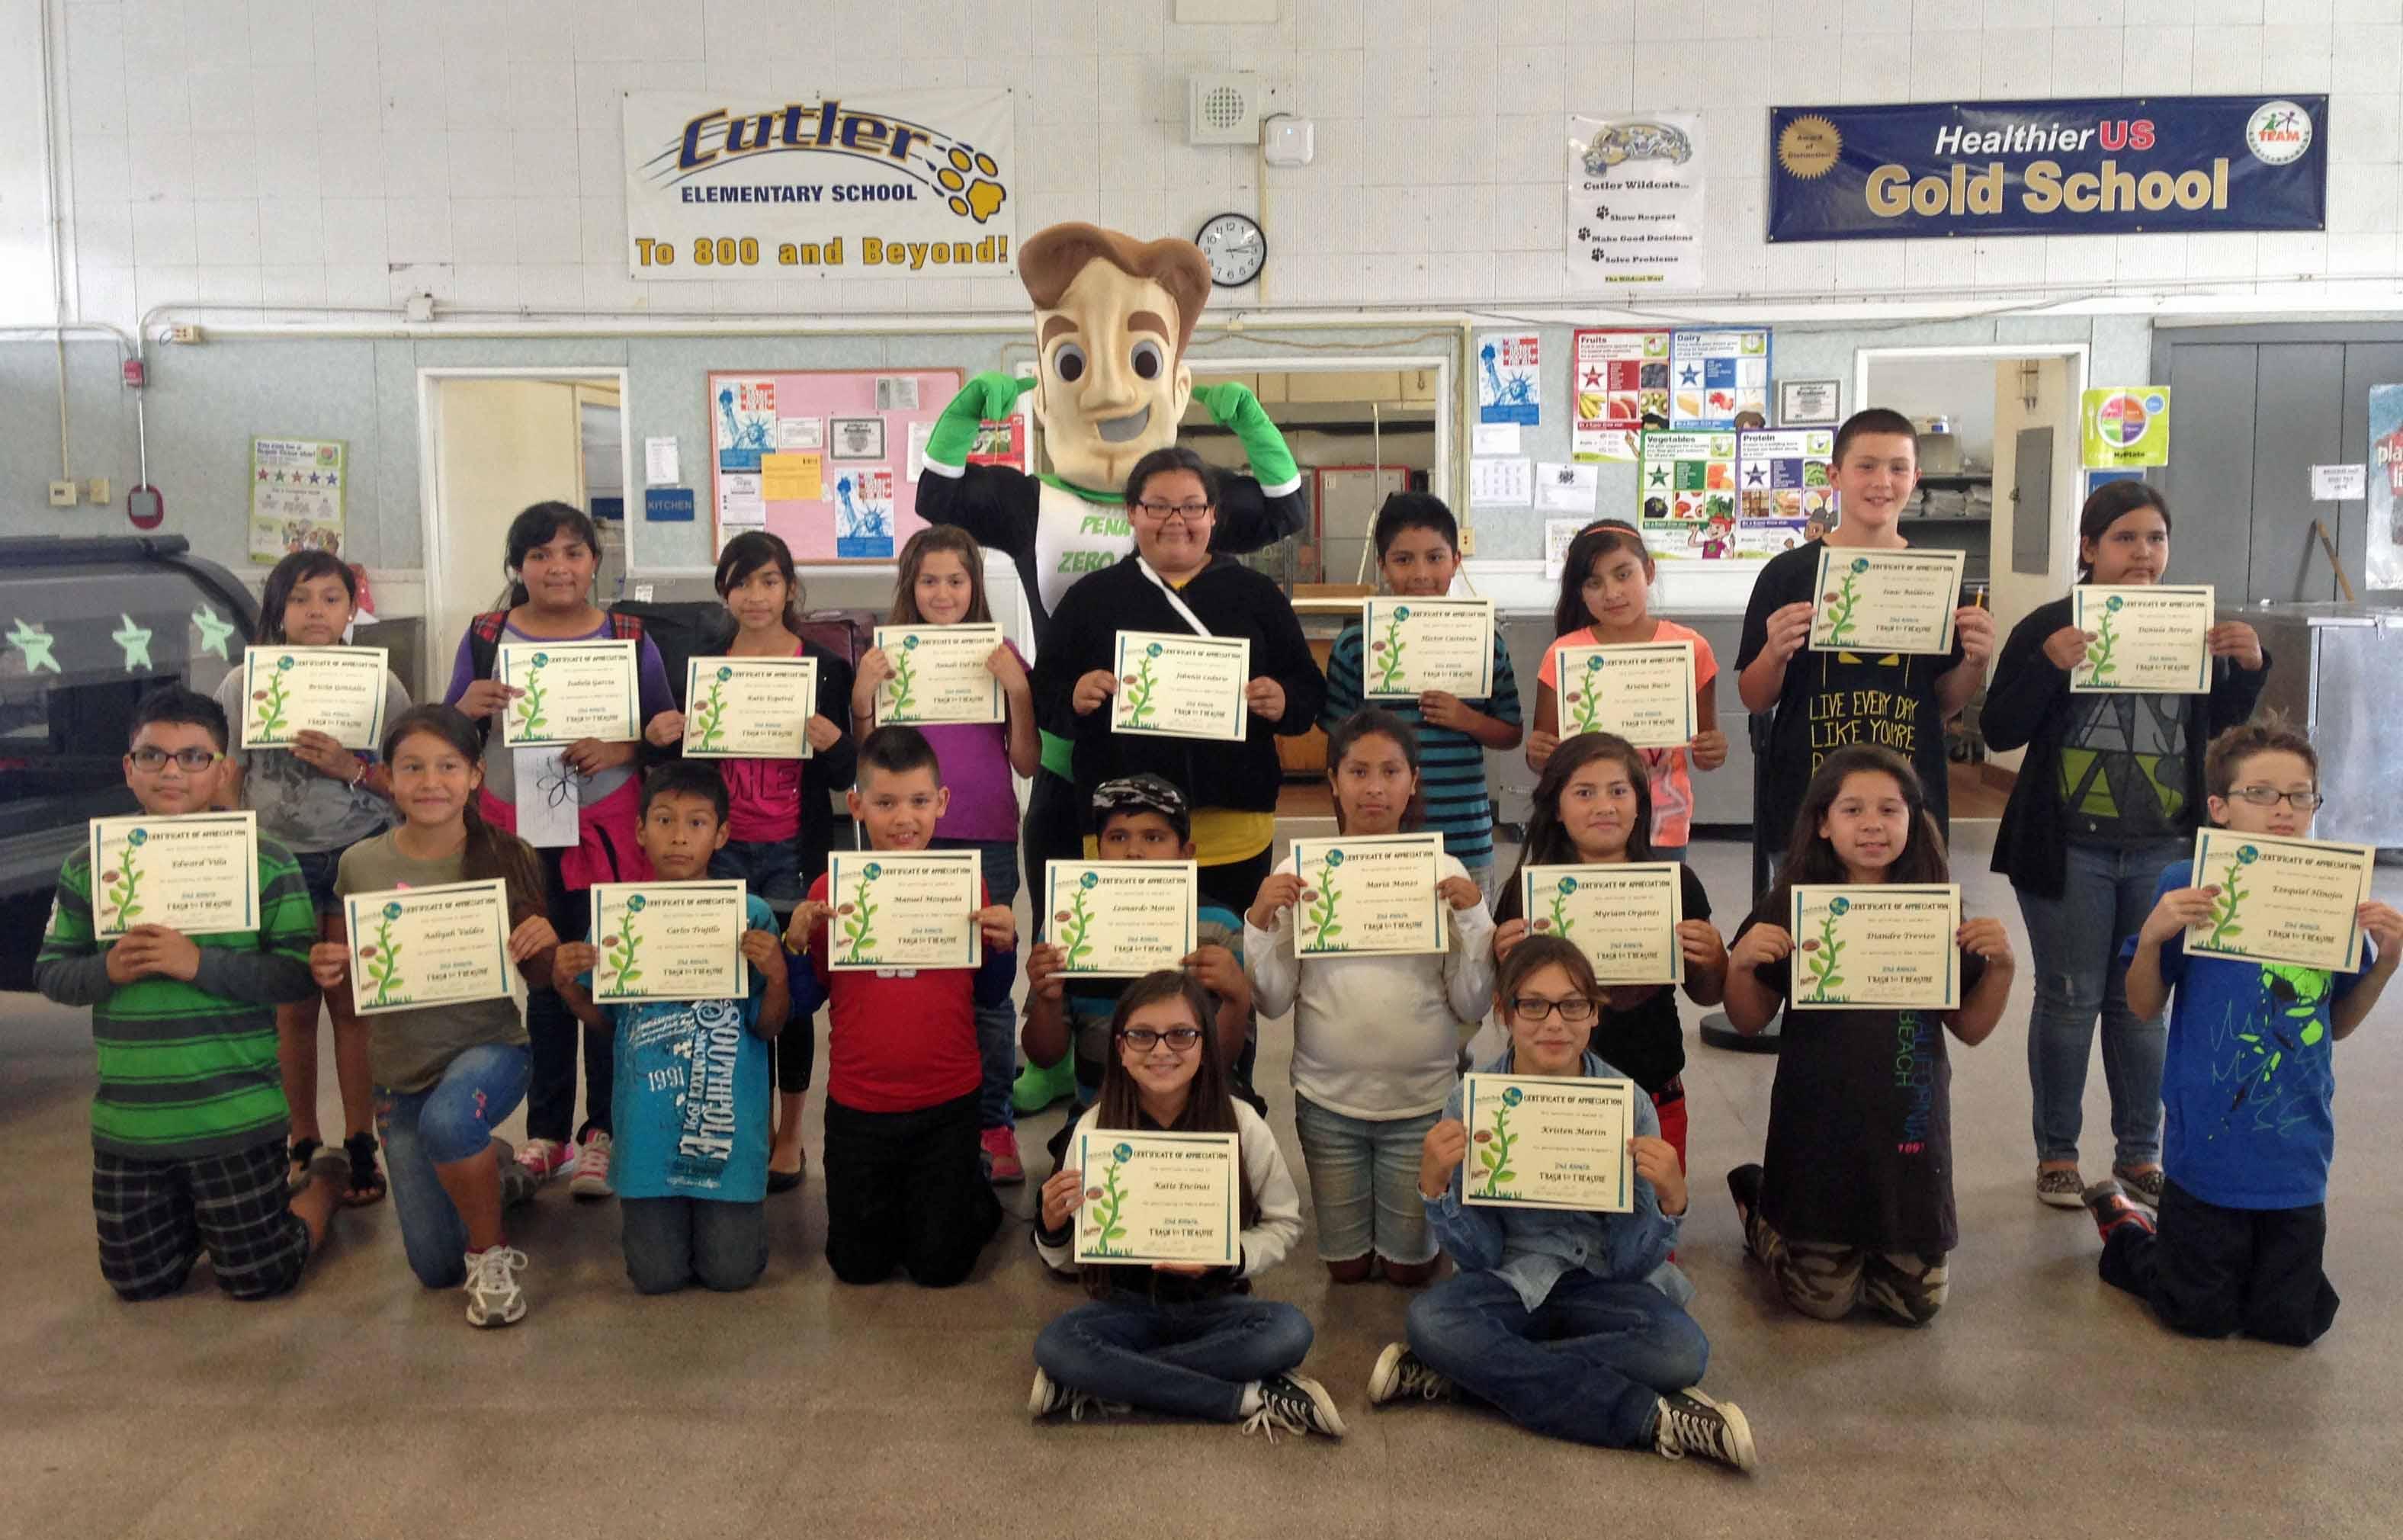 Cutler Elementary 5th Graders